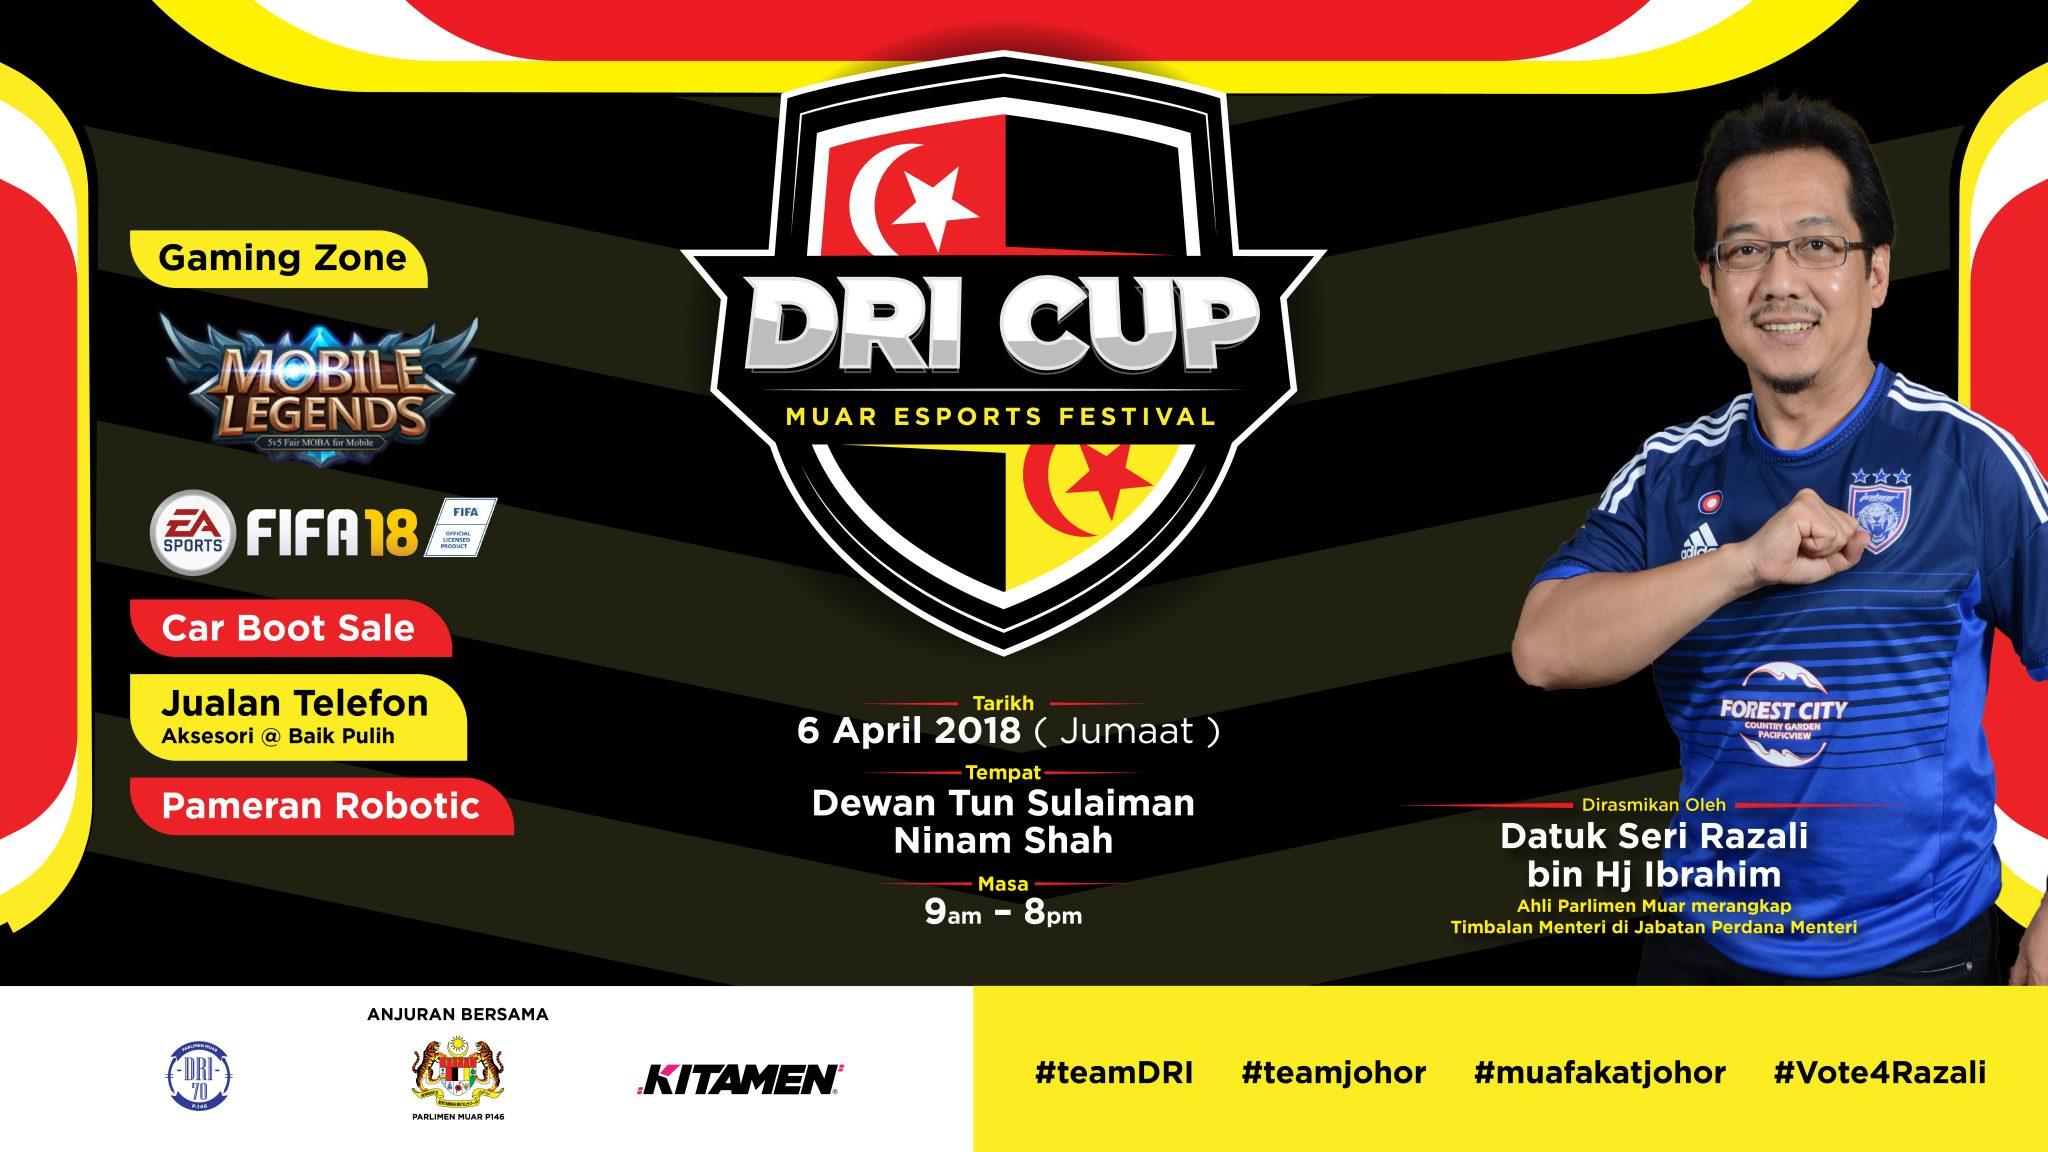 DRI CUP – Muar Esports Festival